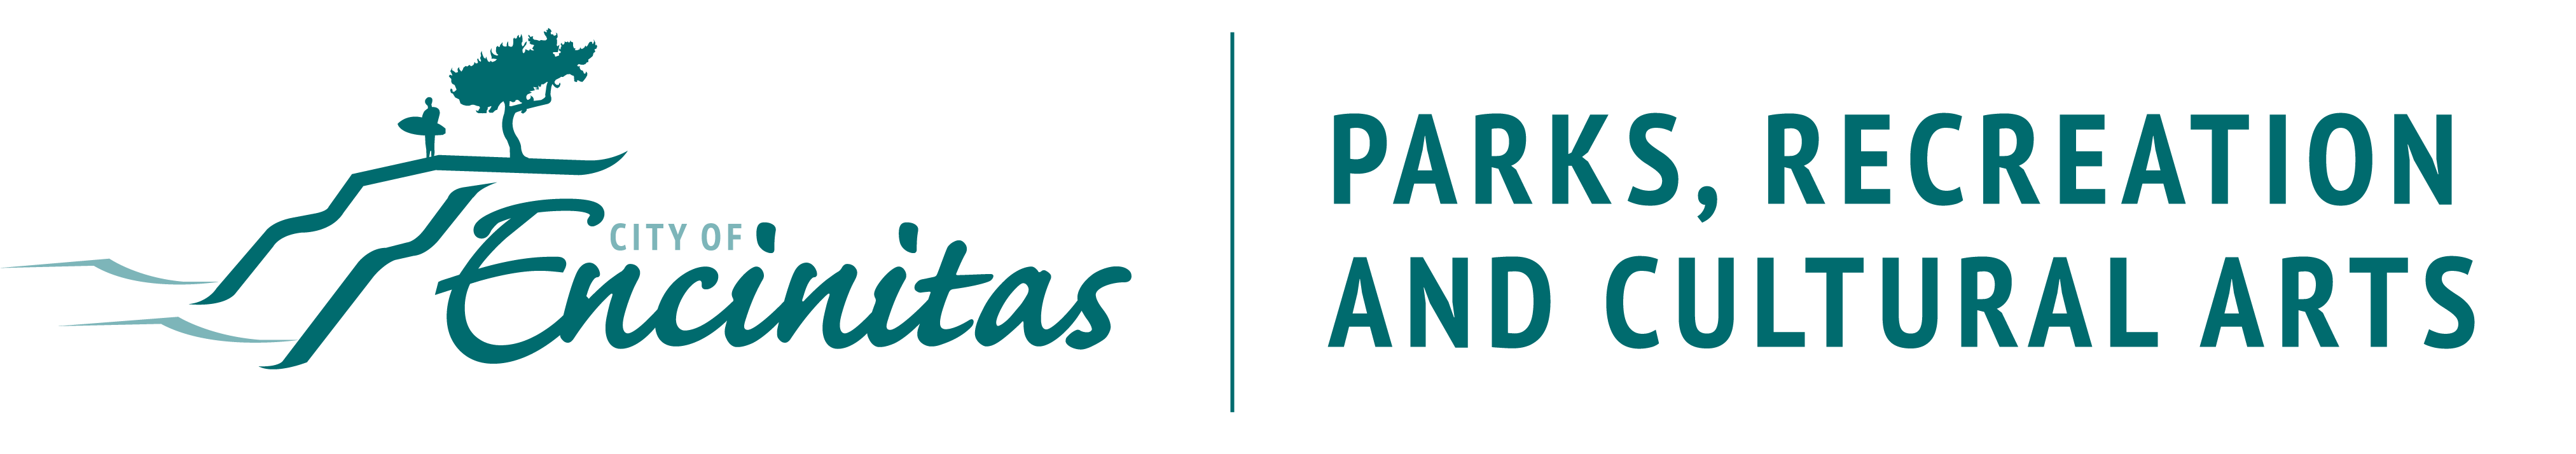 COE_Dept logo